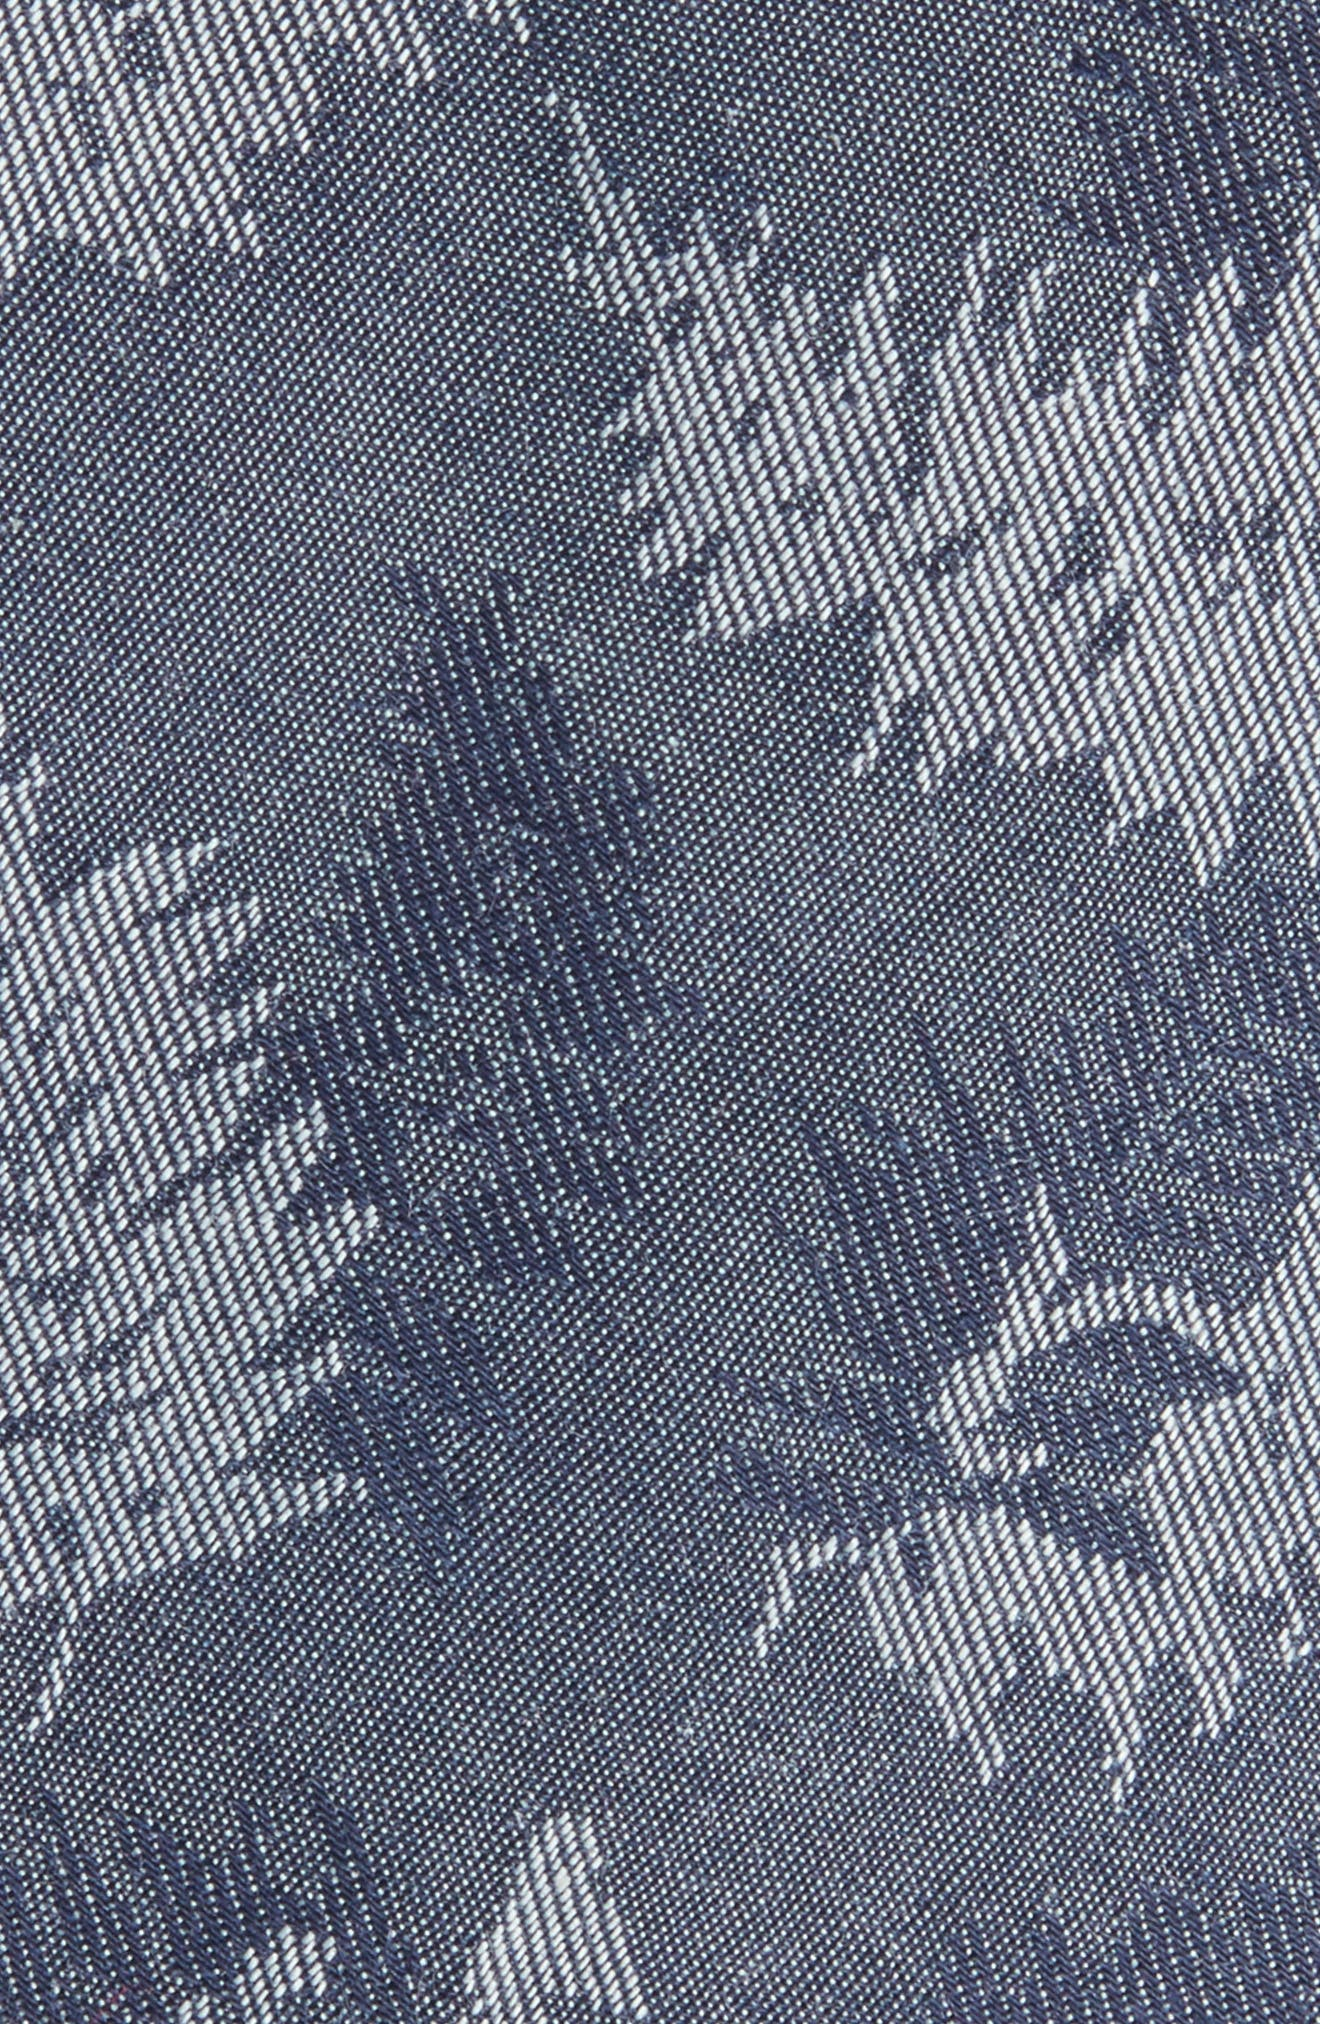 Jody Botanical Print Cotton Tie,                             Alternate thumbnail 2, color,                             410